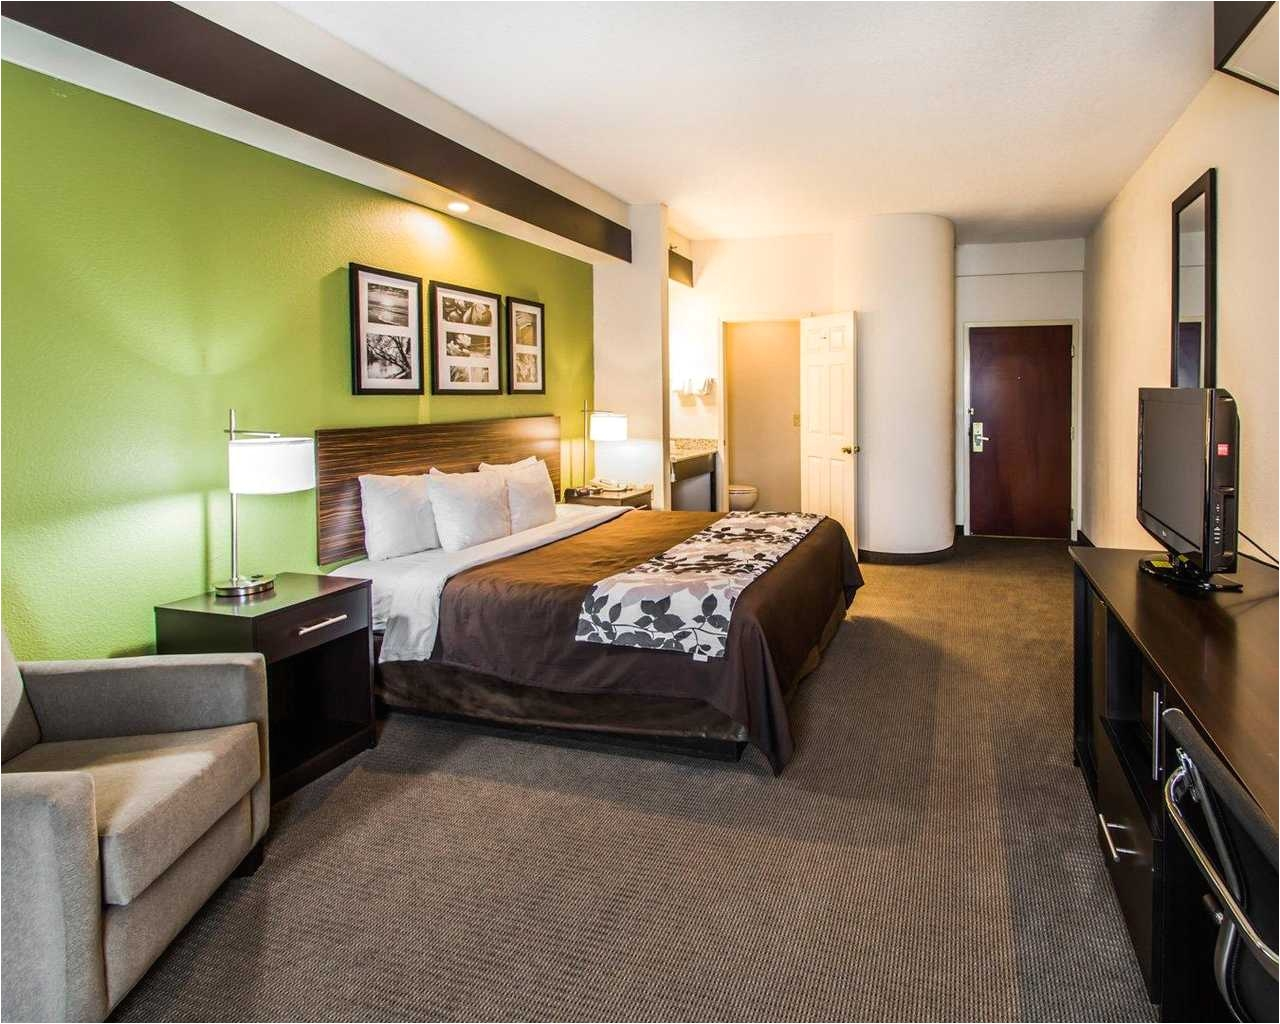 2 Bedroom Hotels In orlando Florida Sleep Inn orlando Airport Fl Near by Seaworld islands Of Adventure